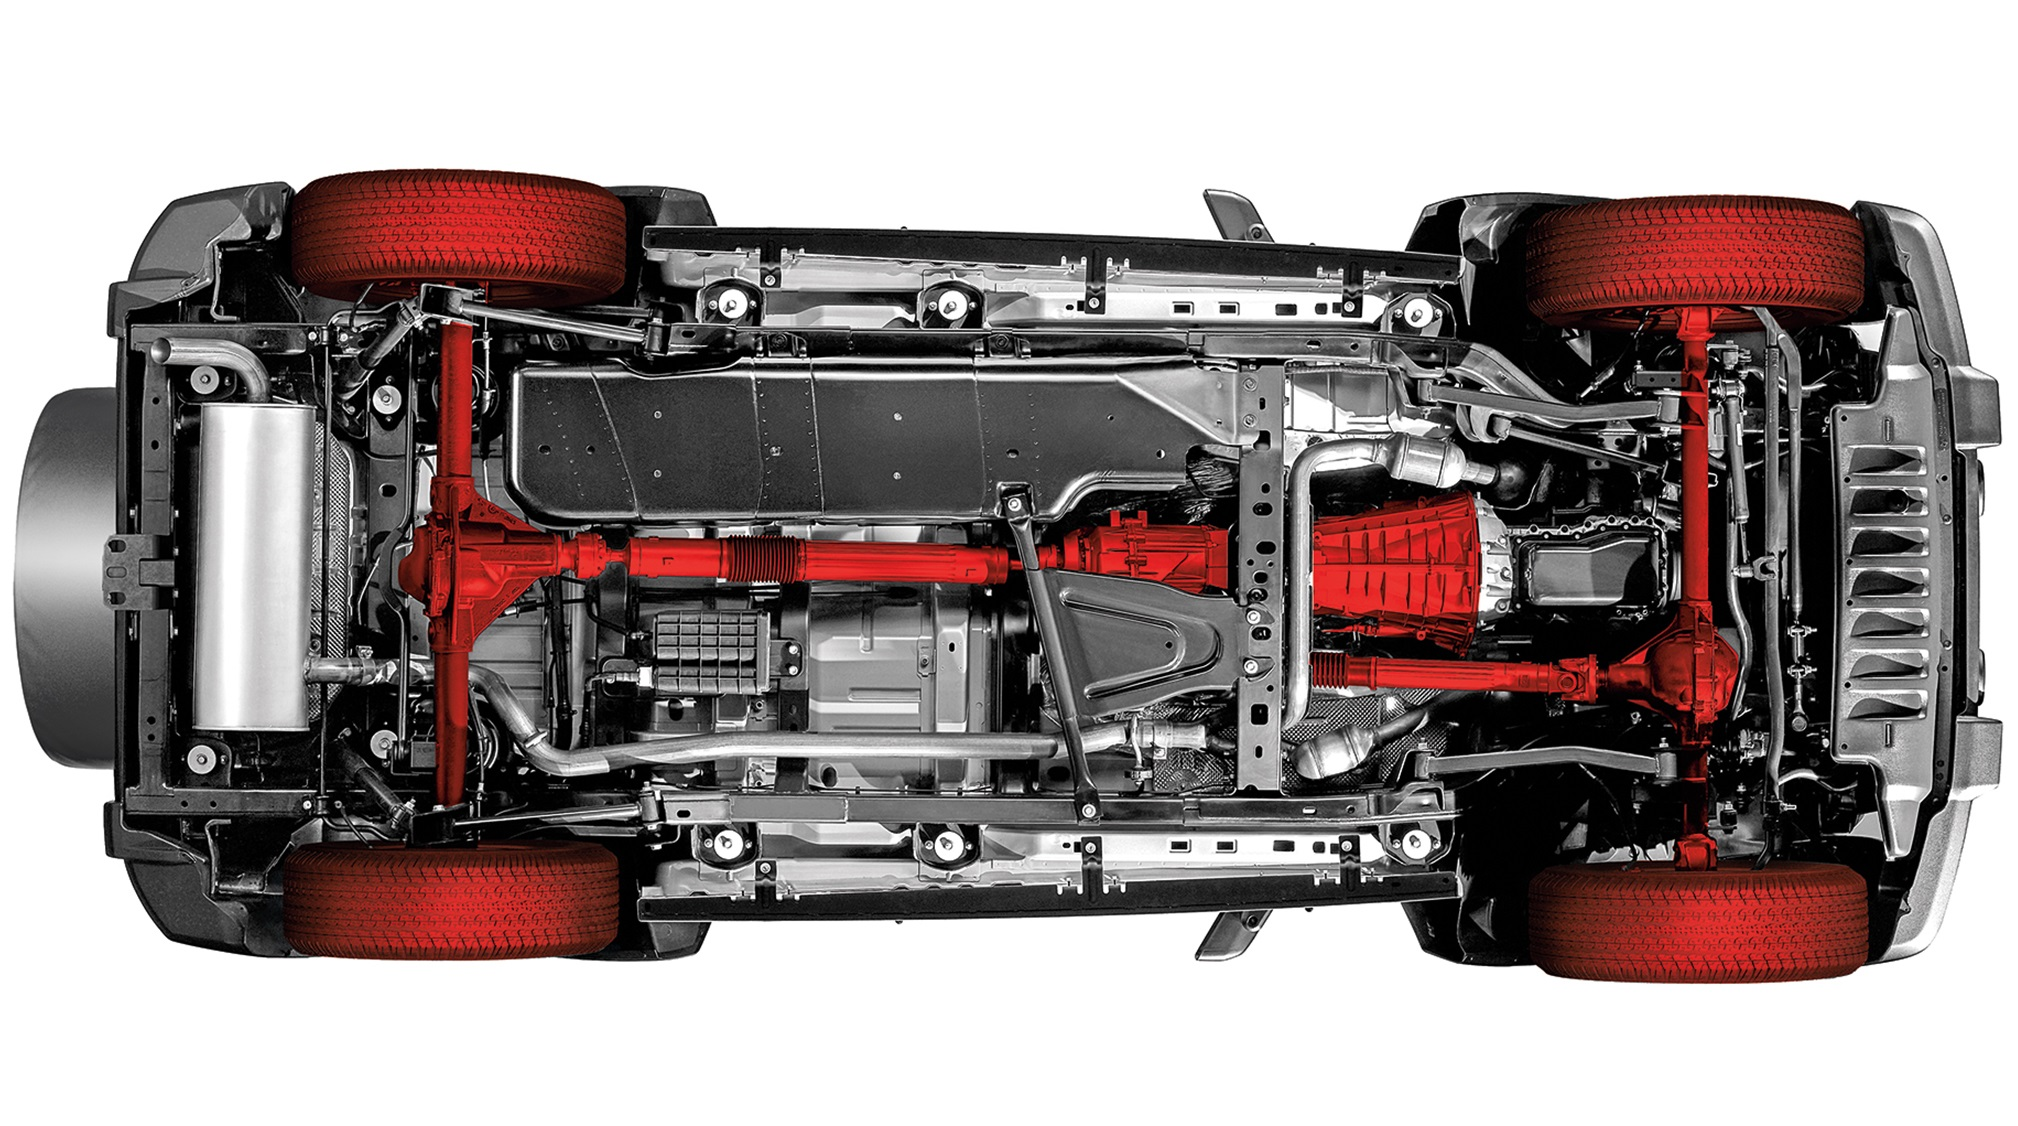 Система полного привода 4WD против AWD: в чем разница